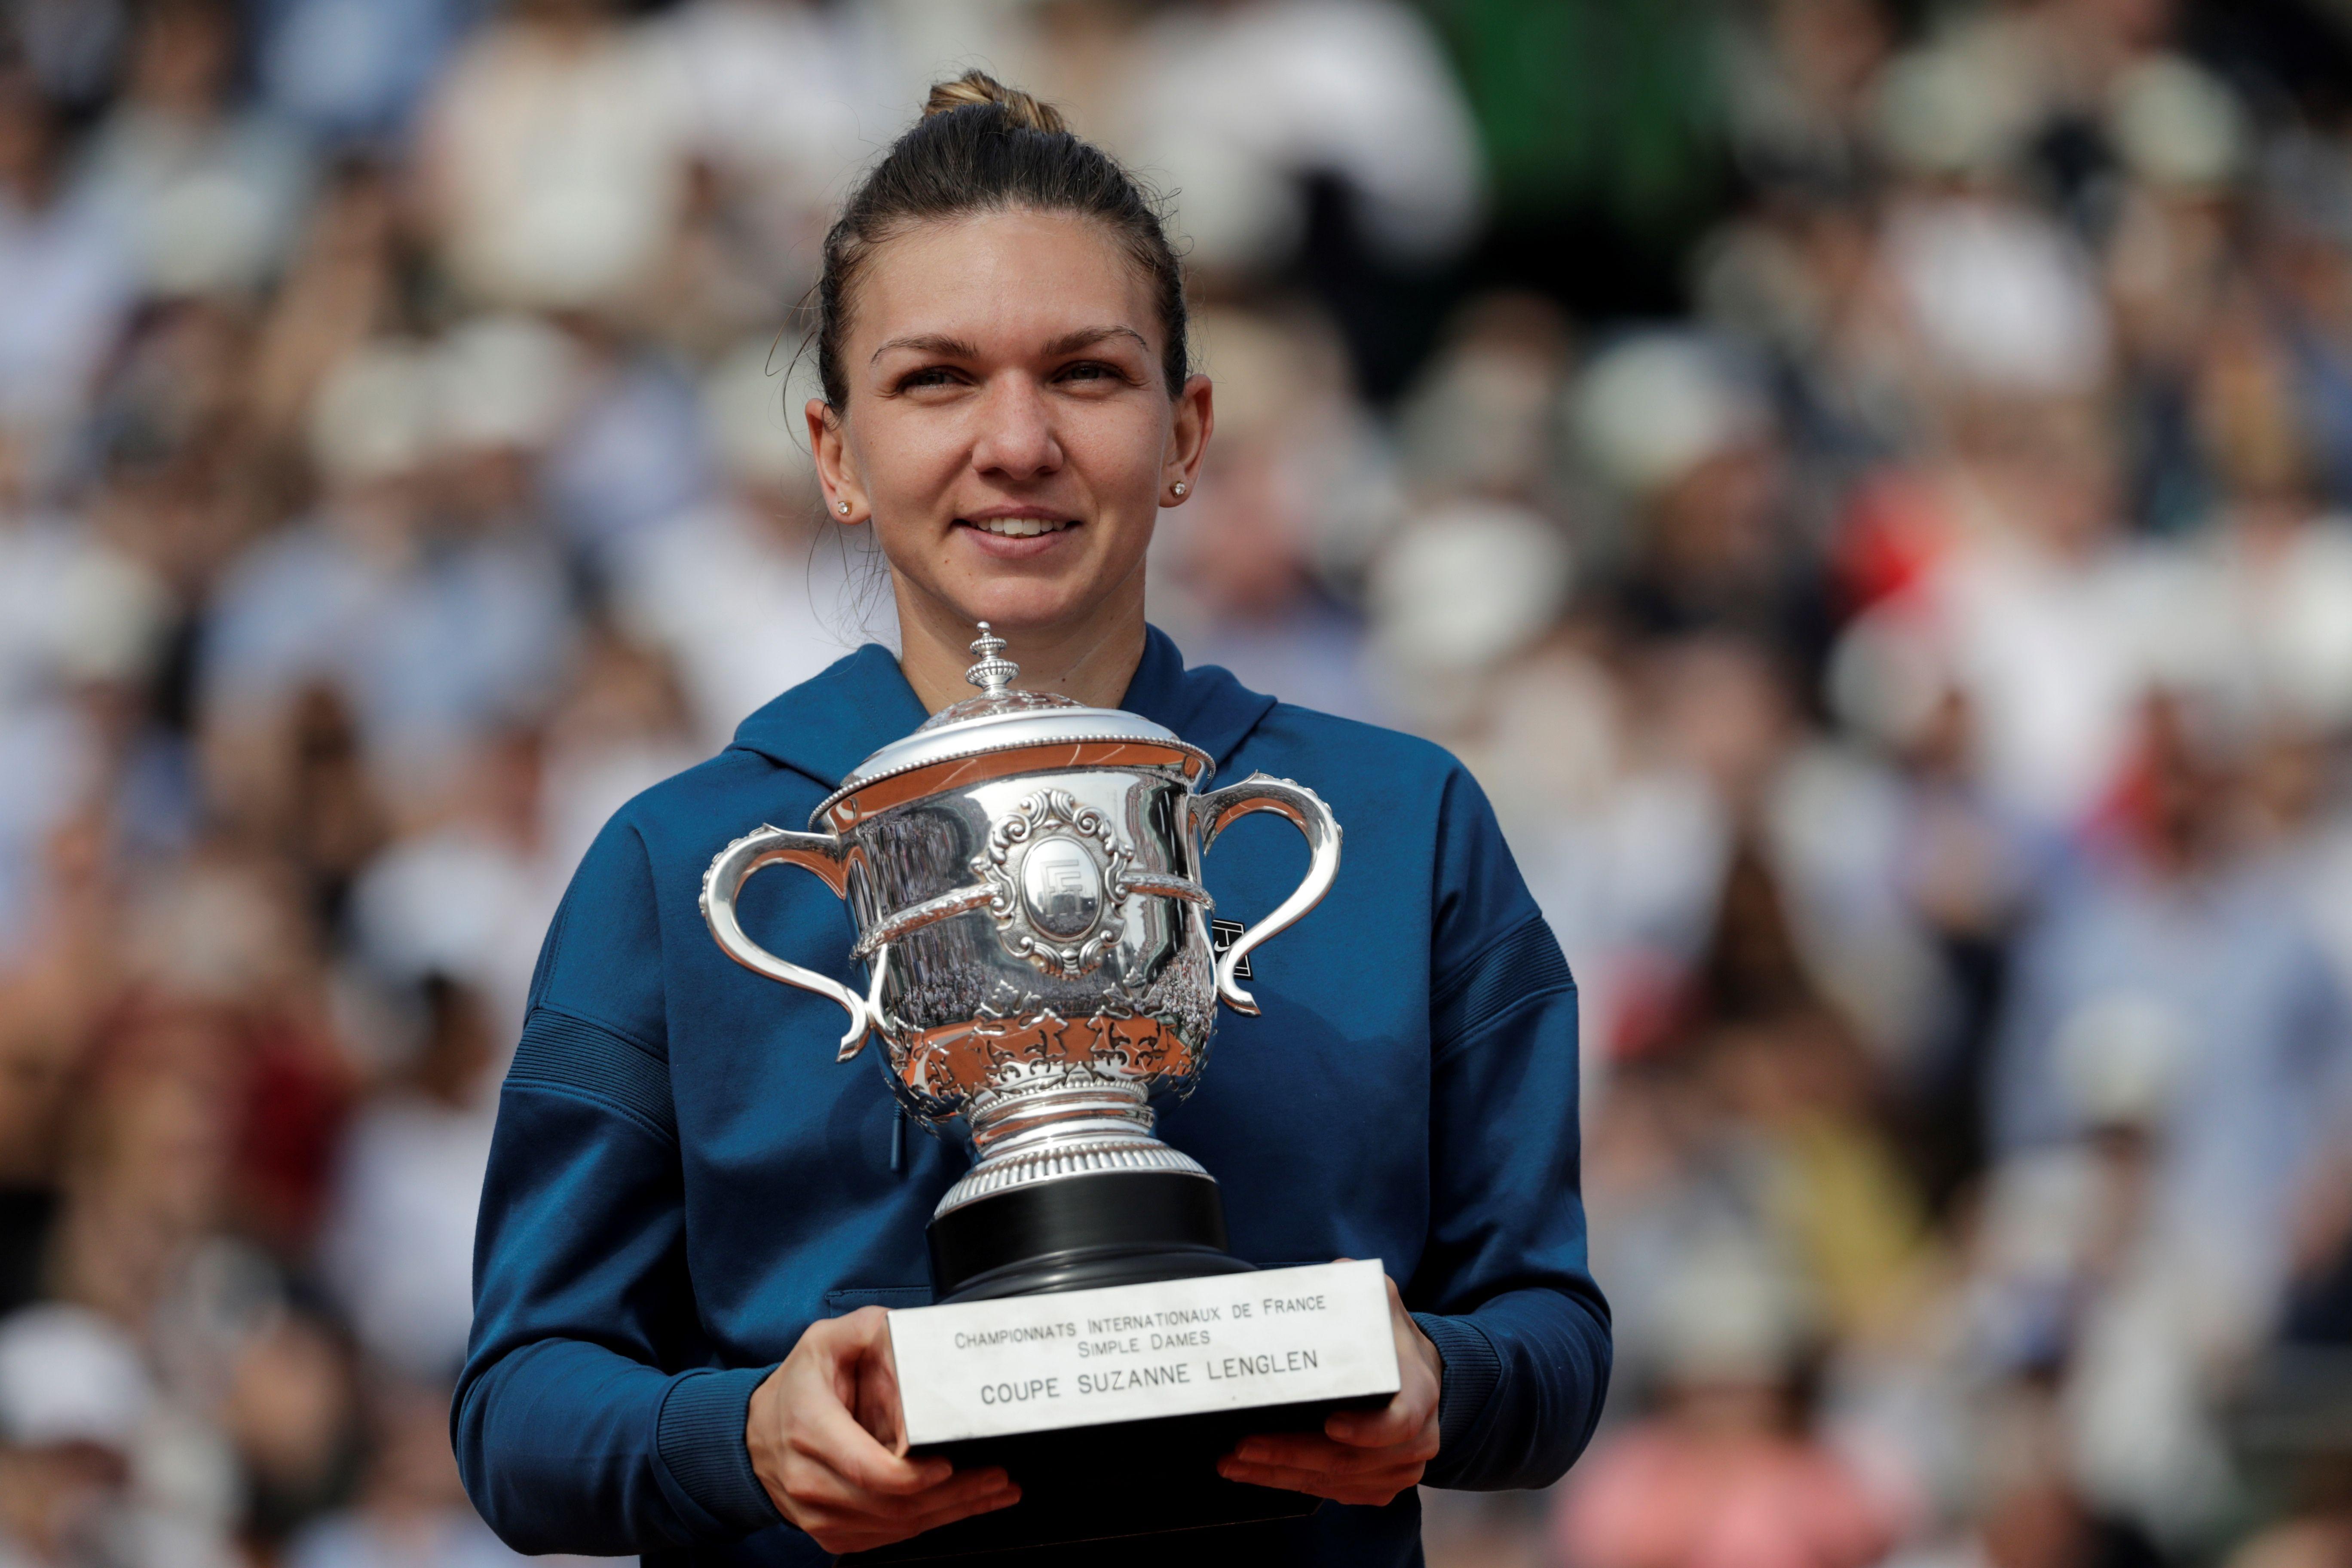 French Open   Simona Halep beats Sloane Stephens in final